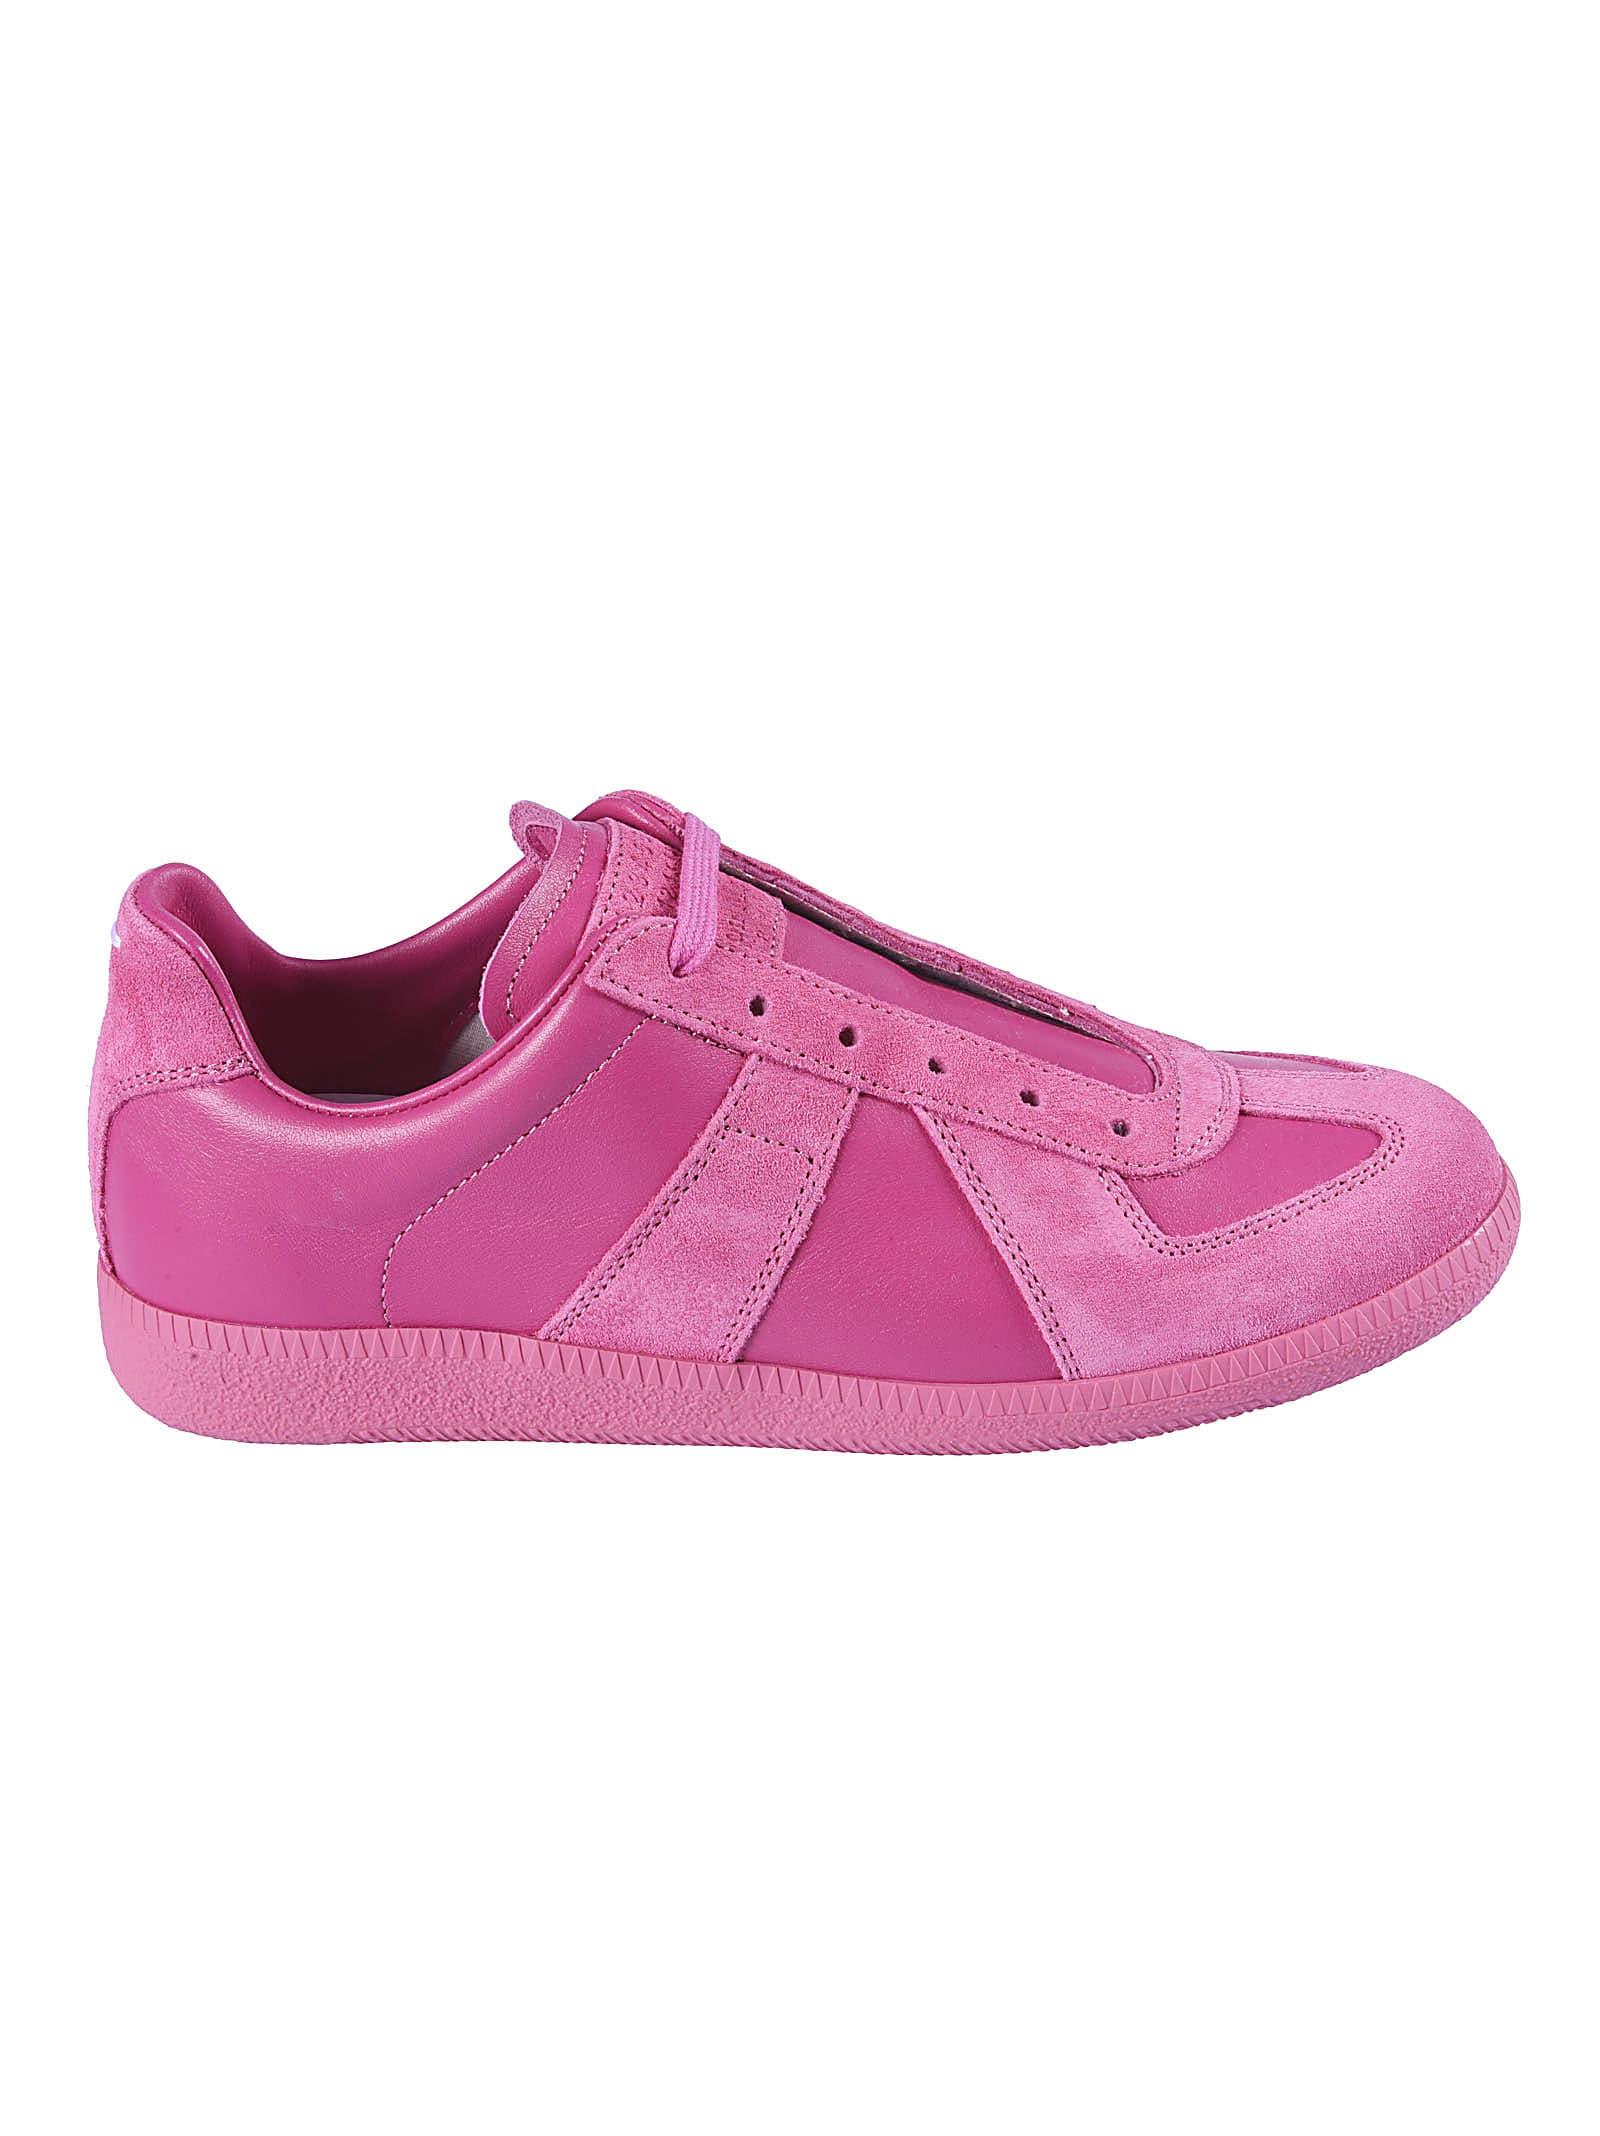 Buy Maison Margiela Classic Paneled Sneakers online, shop Maison Margiela shoes with free shipping